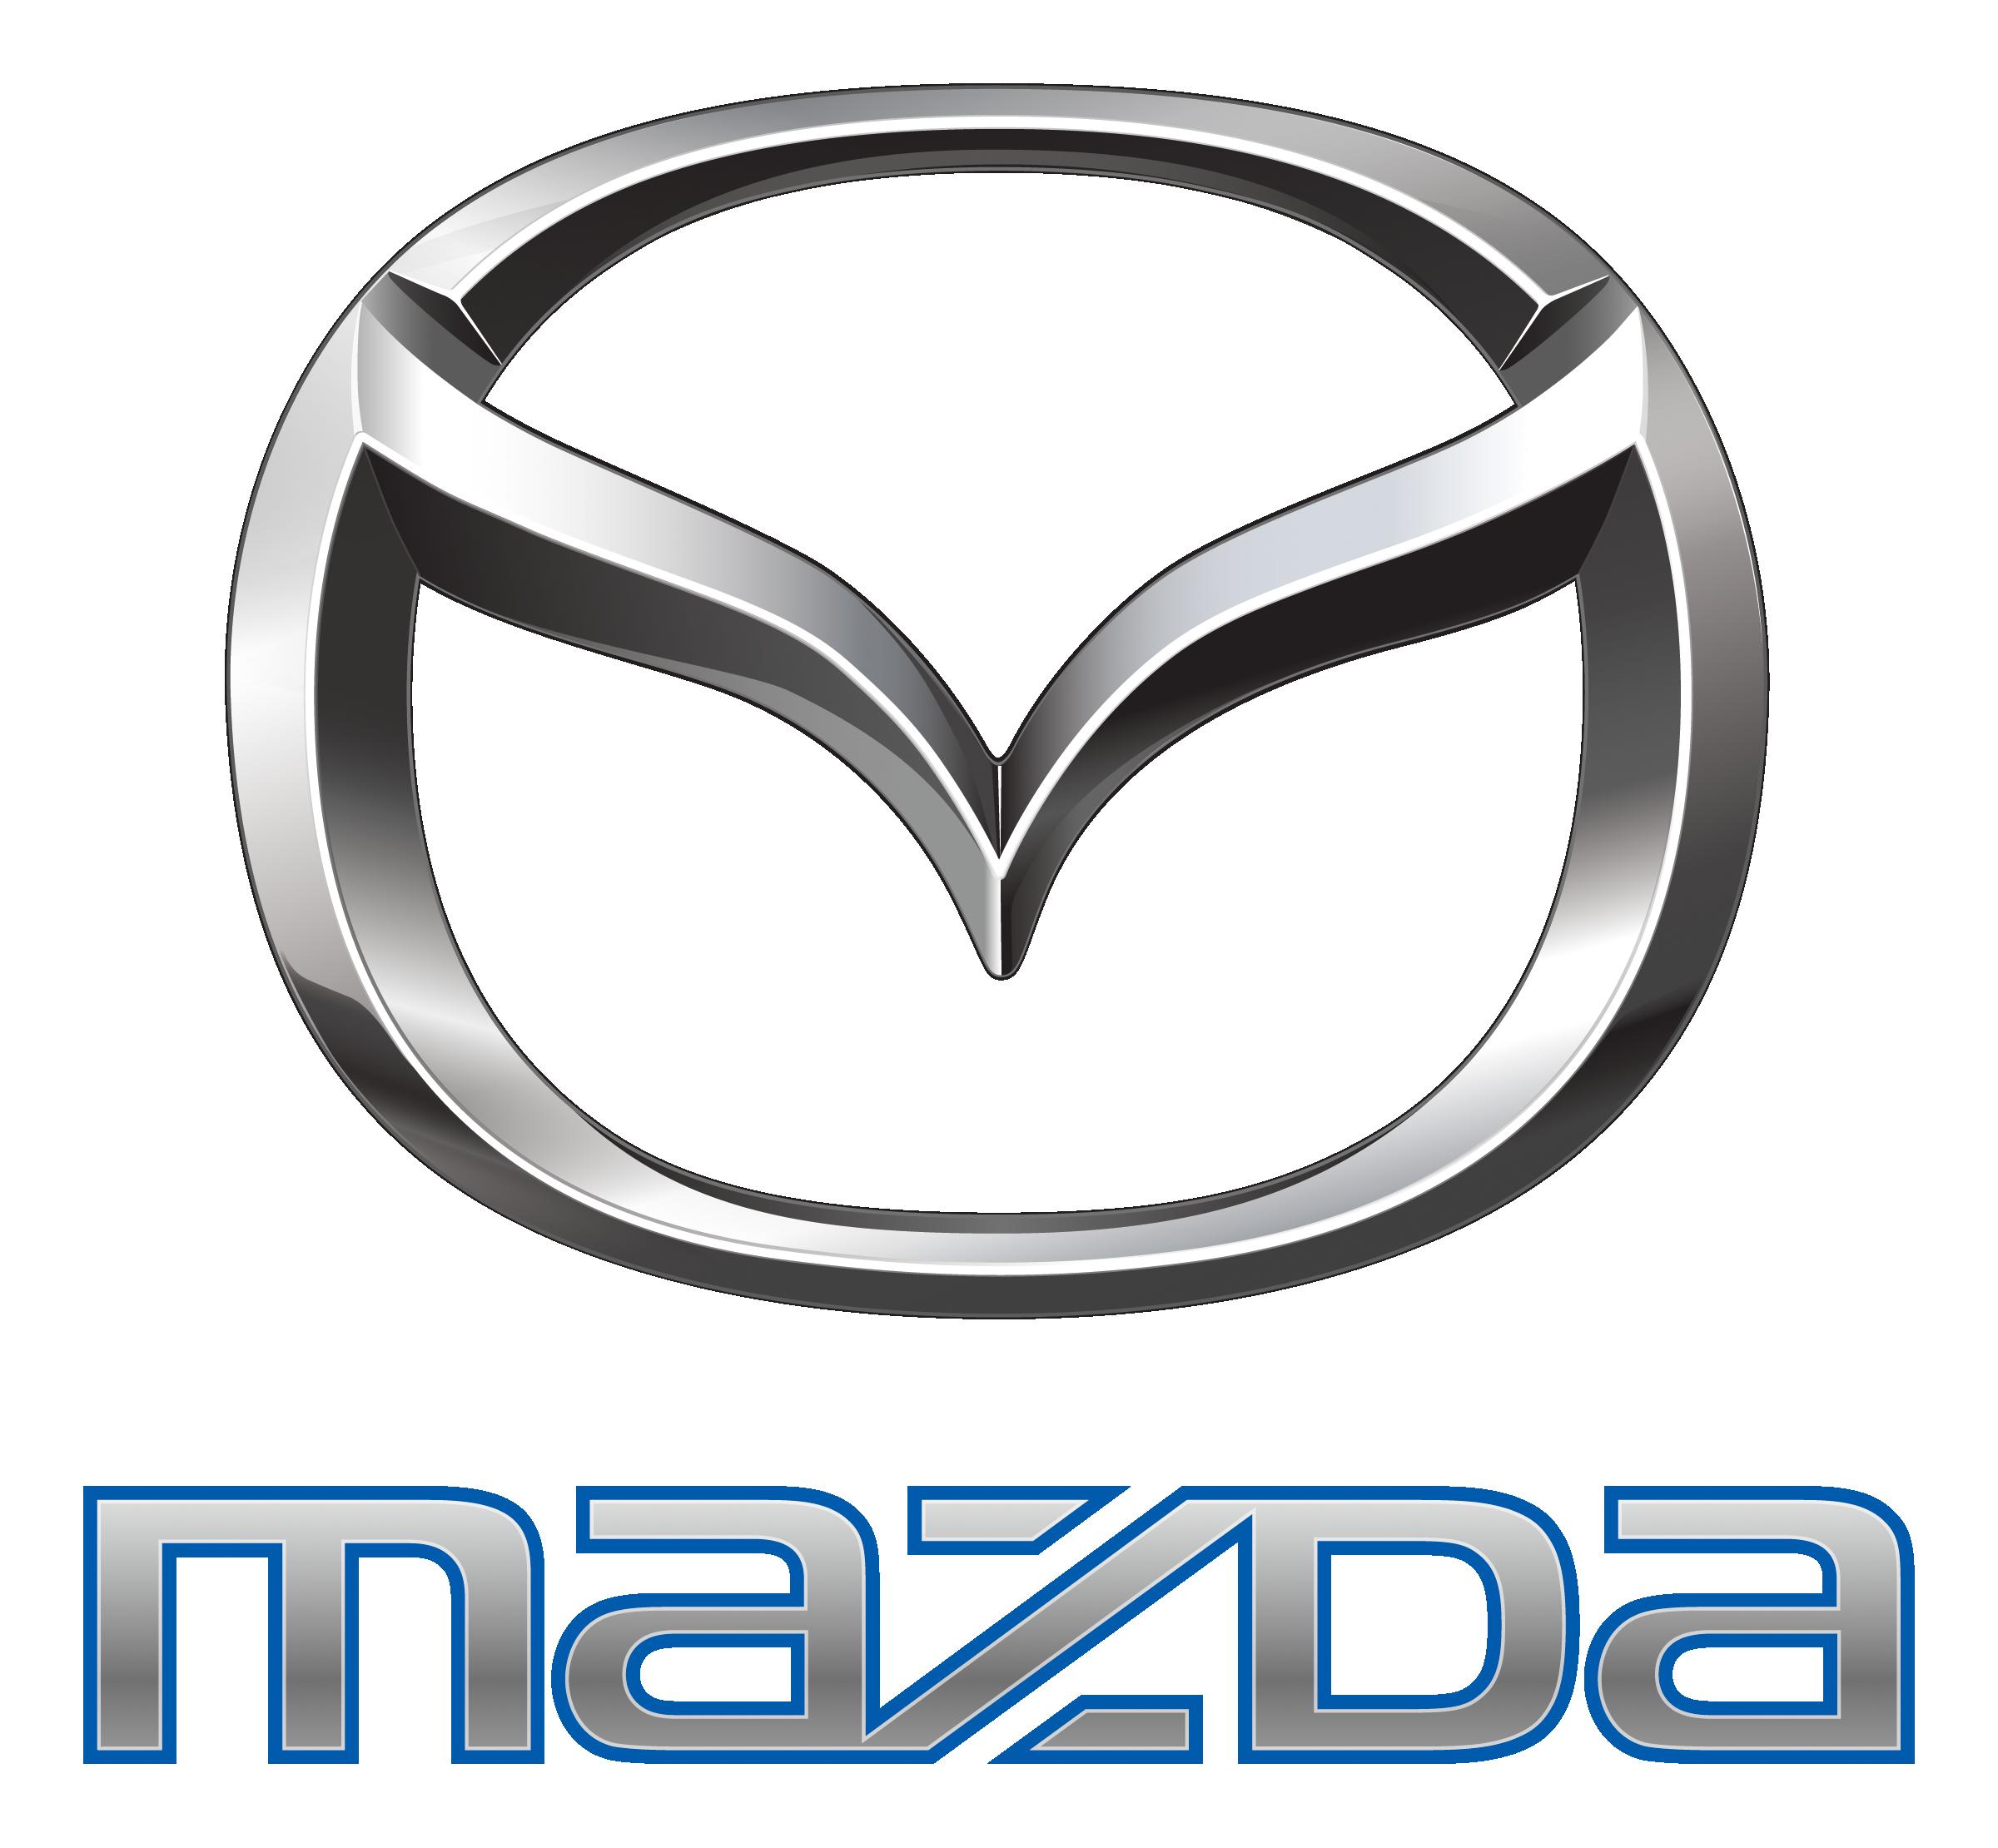 Logo mazda clipart black and white stock Mazda Logo PNG Transparent Mazda Logo.PNG Images. | PlusPNG black and white stock